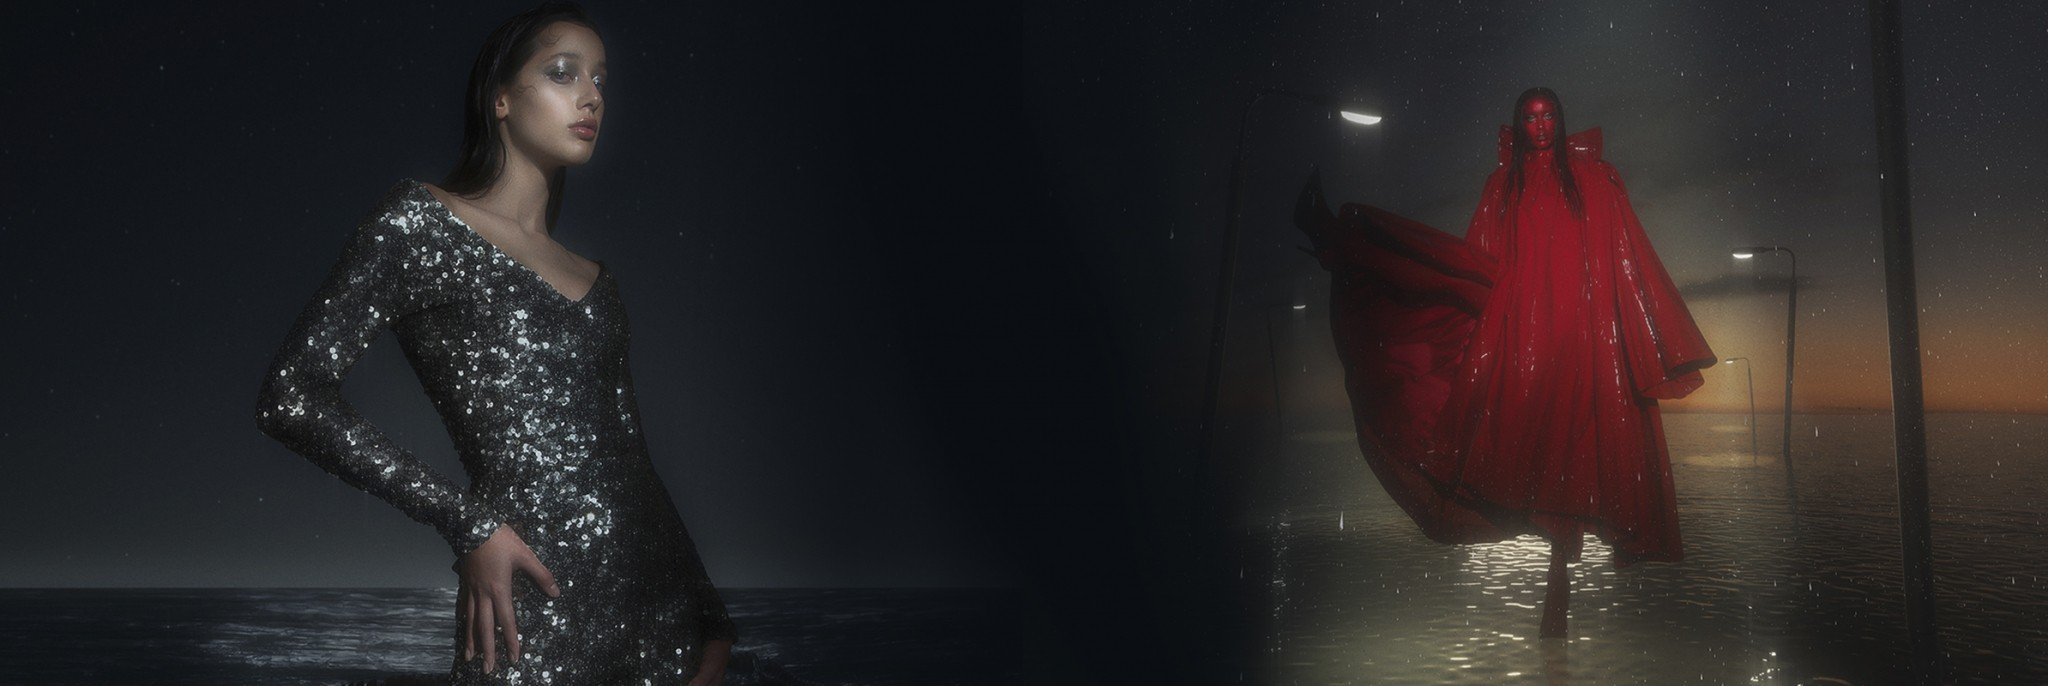 Balenciaga Goes into the Heart of Darkness